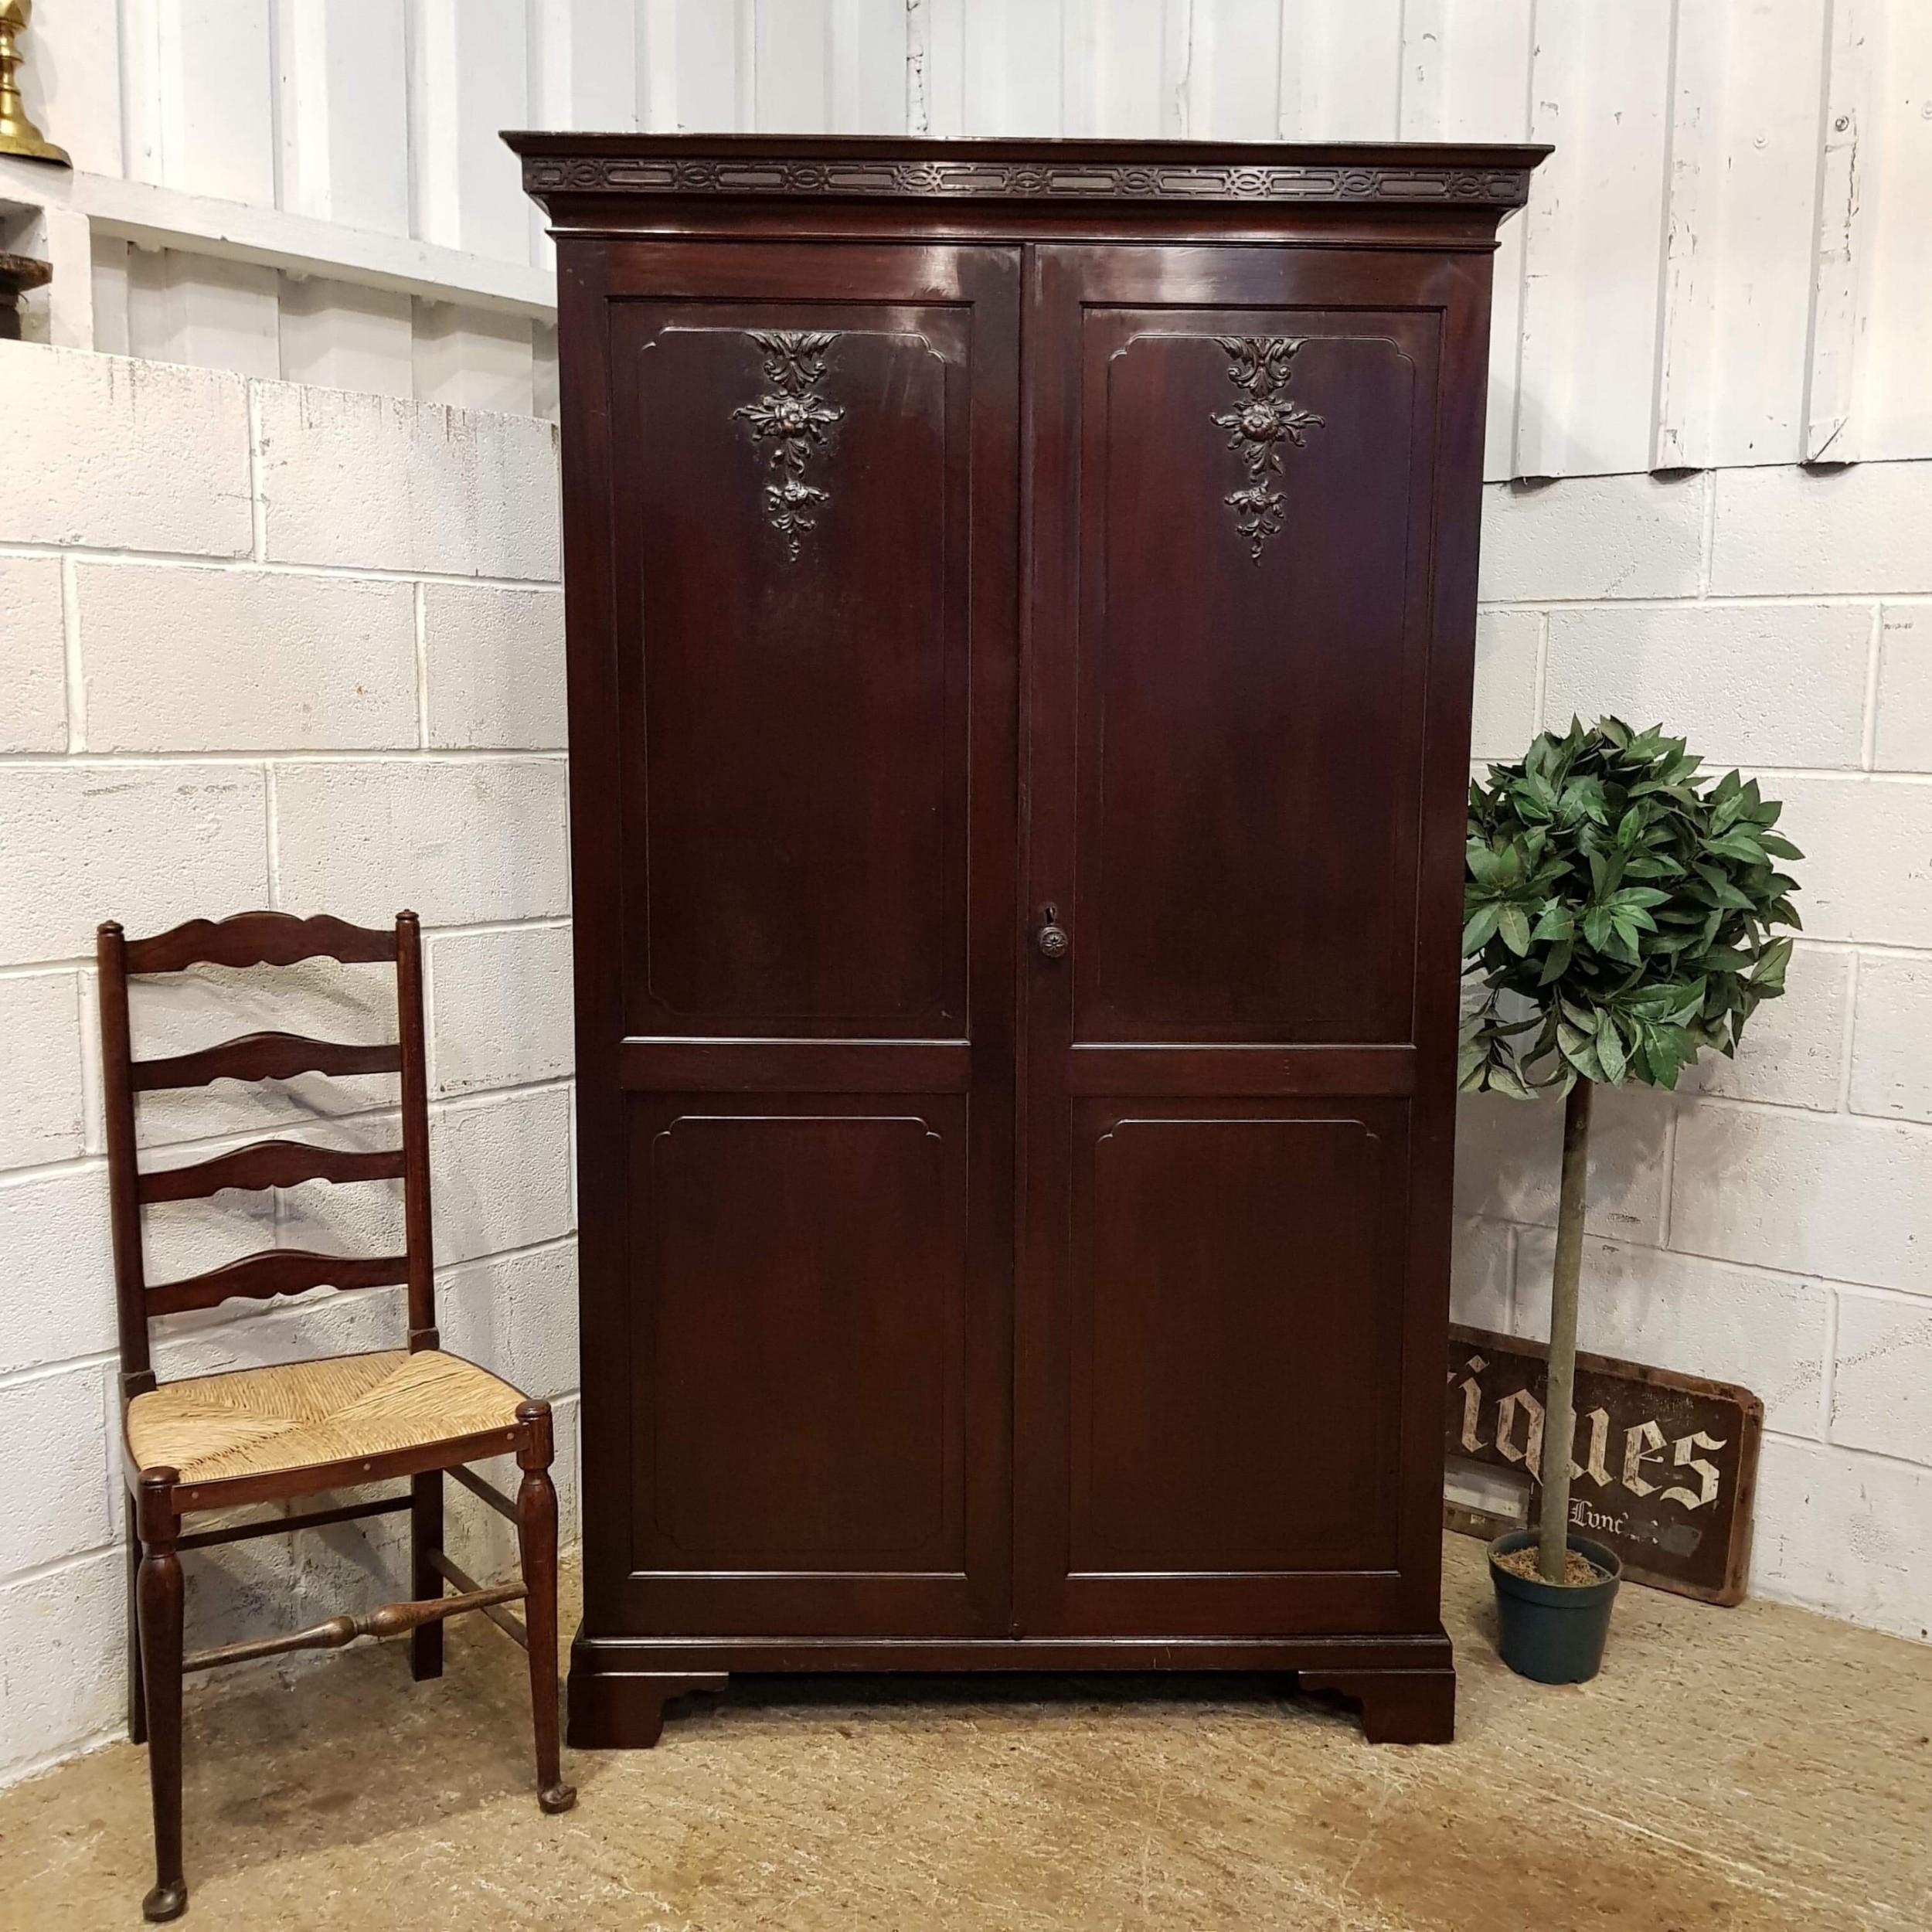 antique edwardian chippendale cuban mahogany double wardrobe c1900